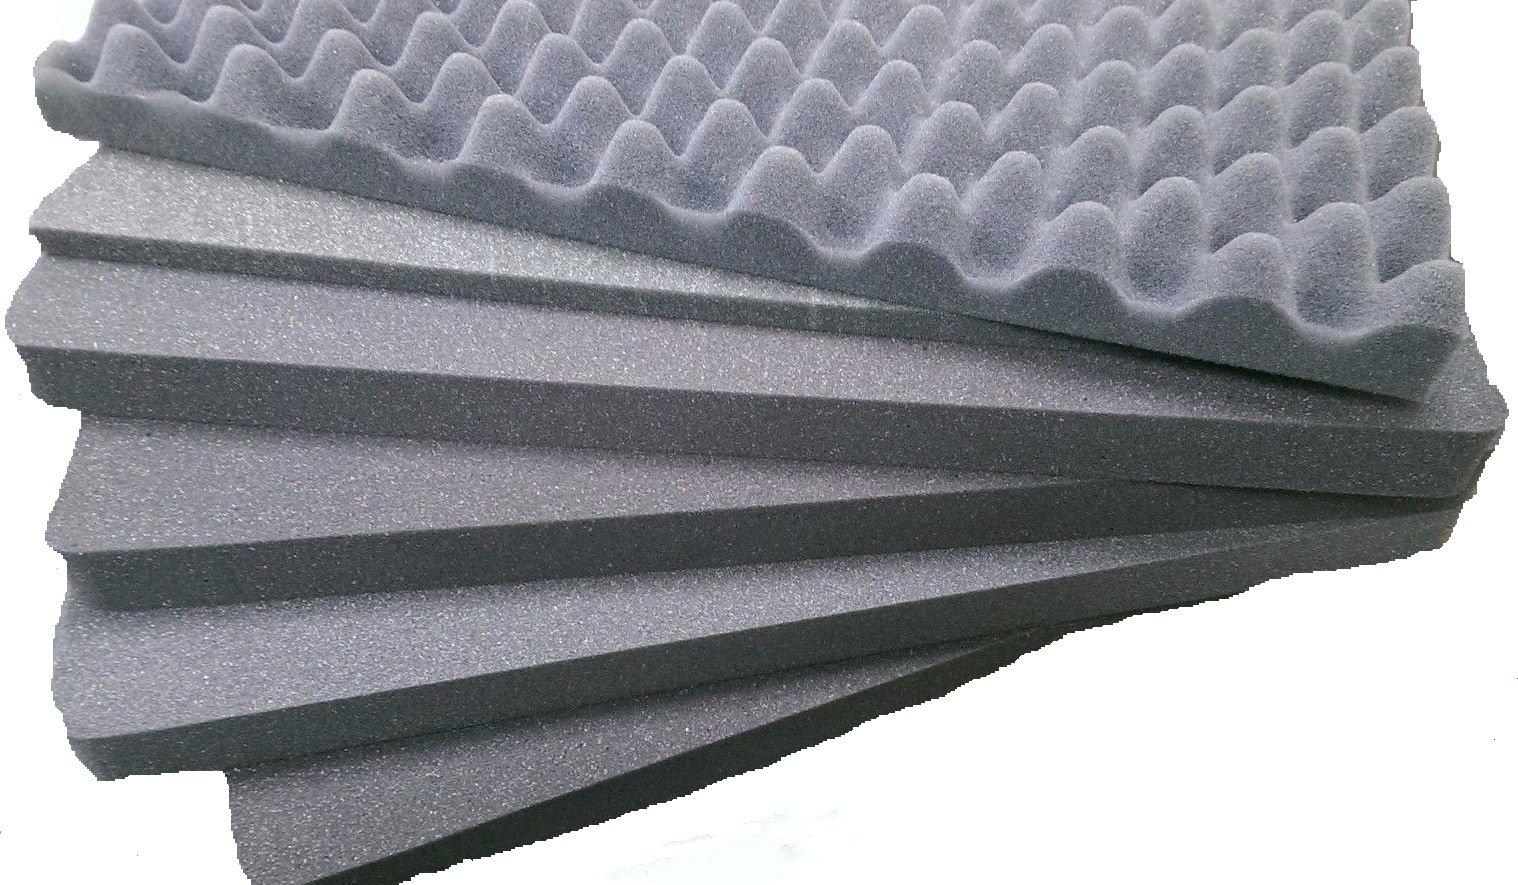 CVPKG presents Pelican 1510 upgraded 6 piece Pluck replacement foam set. 2.5lb Foam